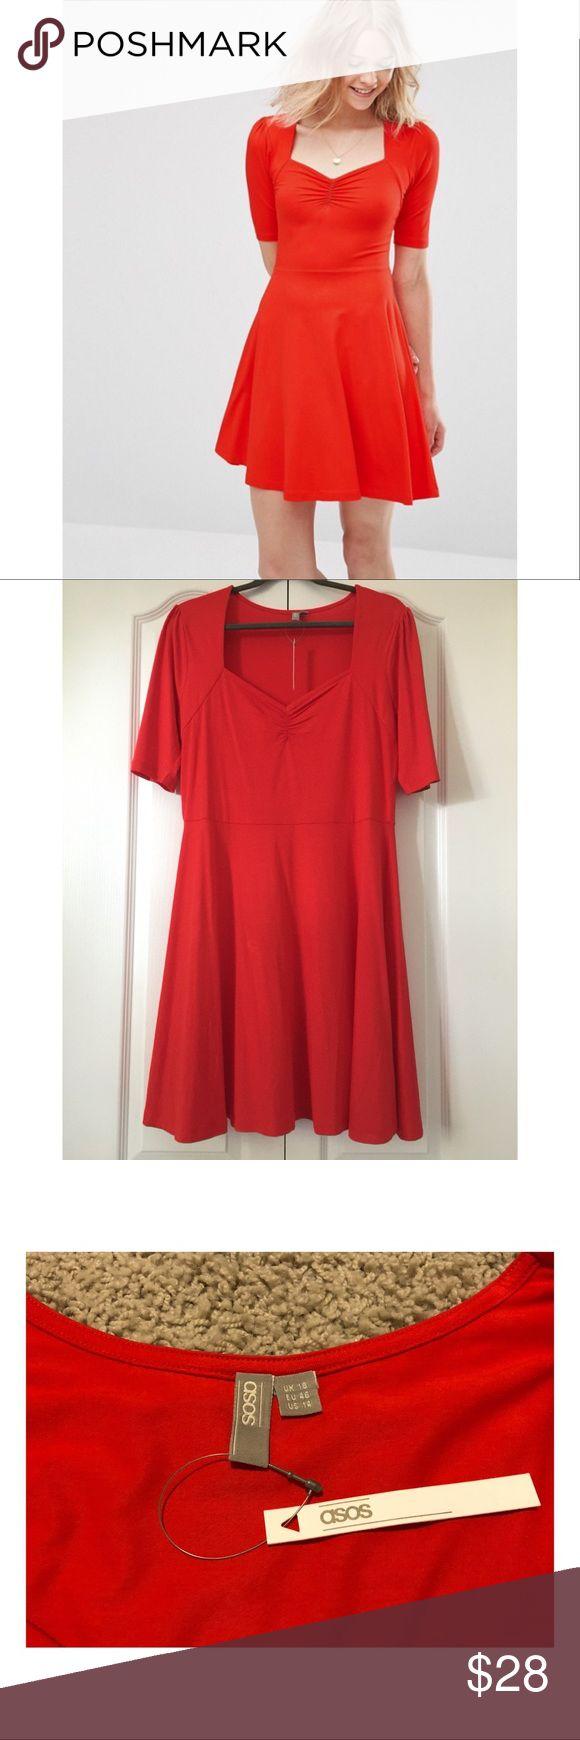 ASOS us14 Fit& Flare Dress, Sweetheart Neckline NWT ASOS UK 18/US 14 red dress with sweetheart neckline Asos Dresses